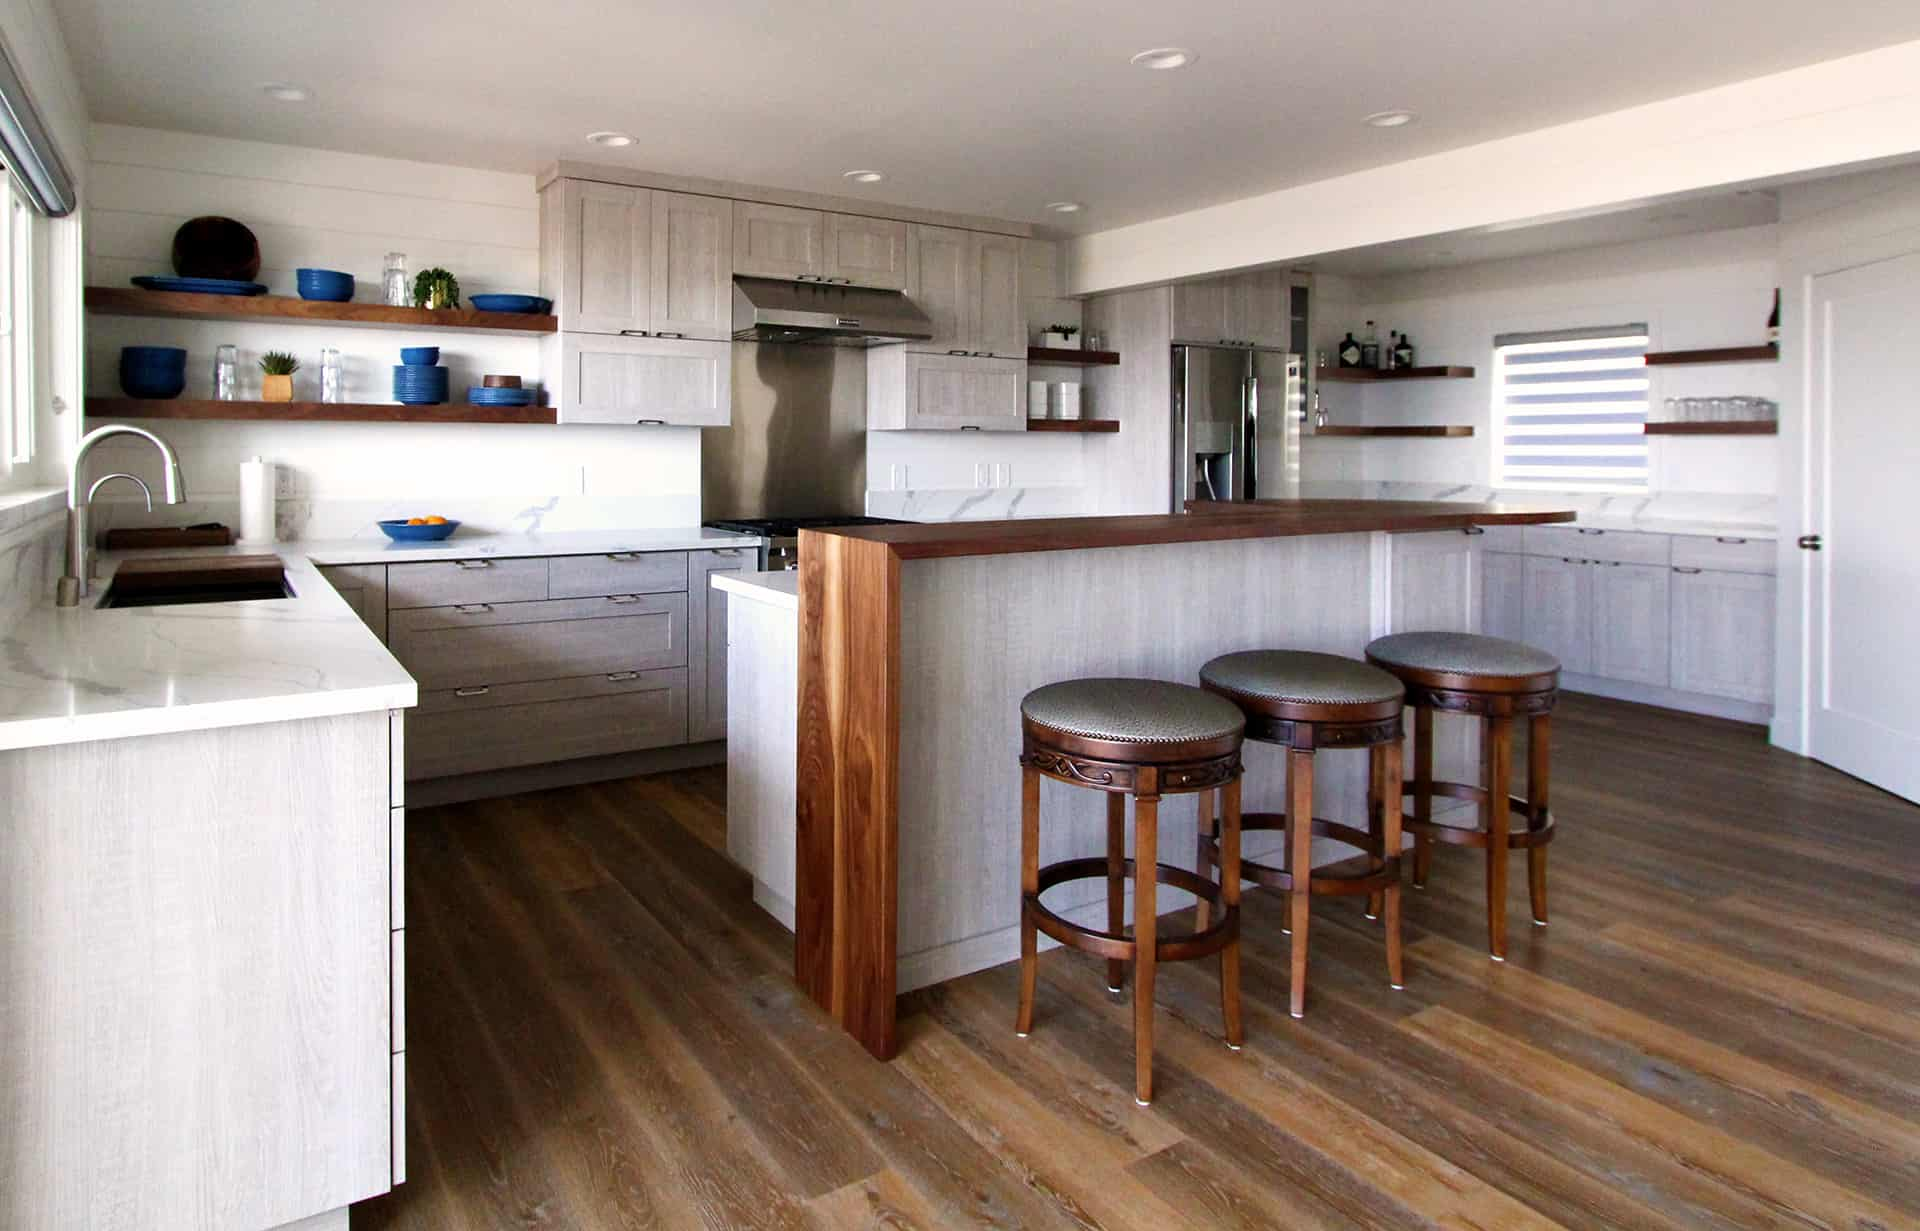 Beautiful kitchen renovation in beach house